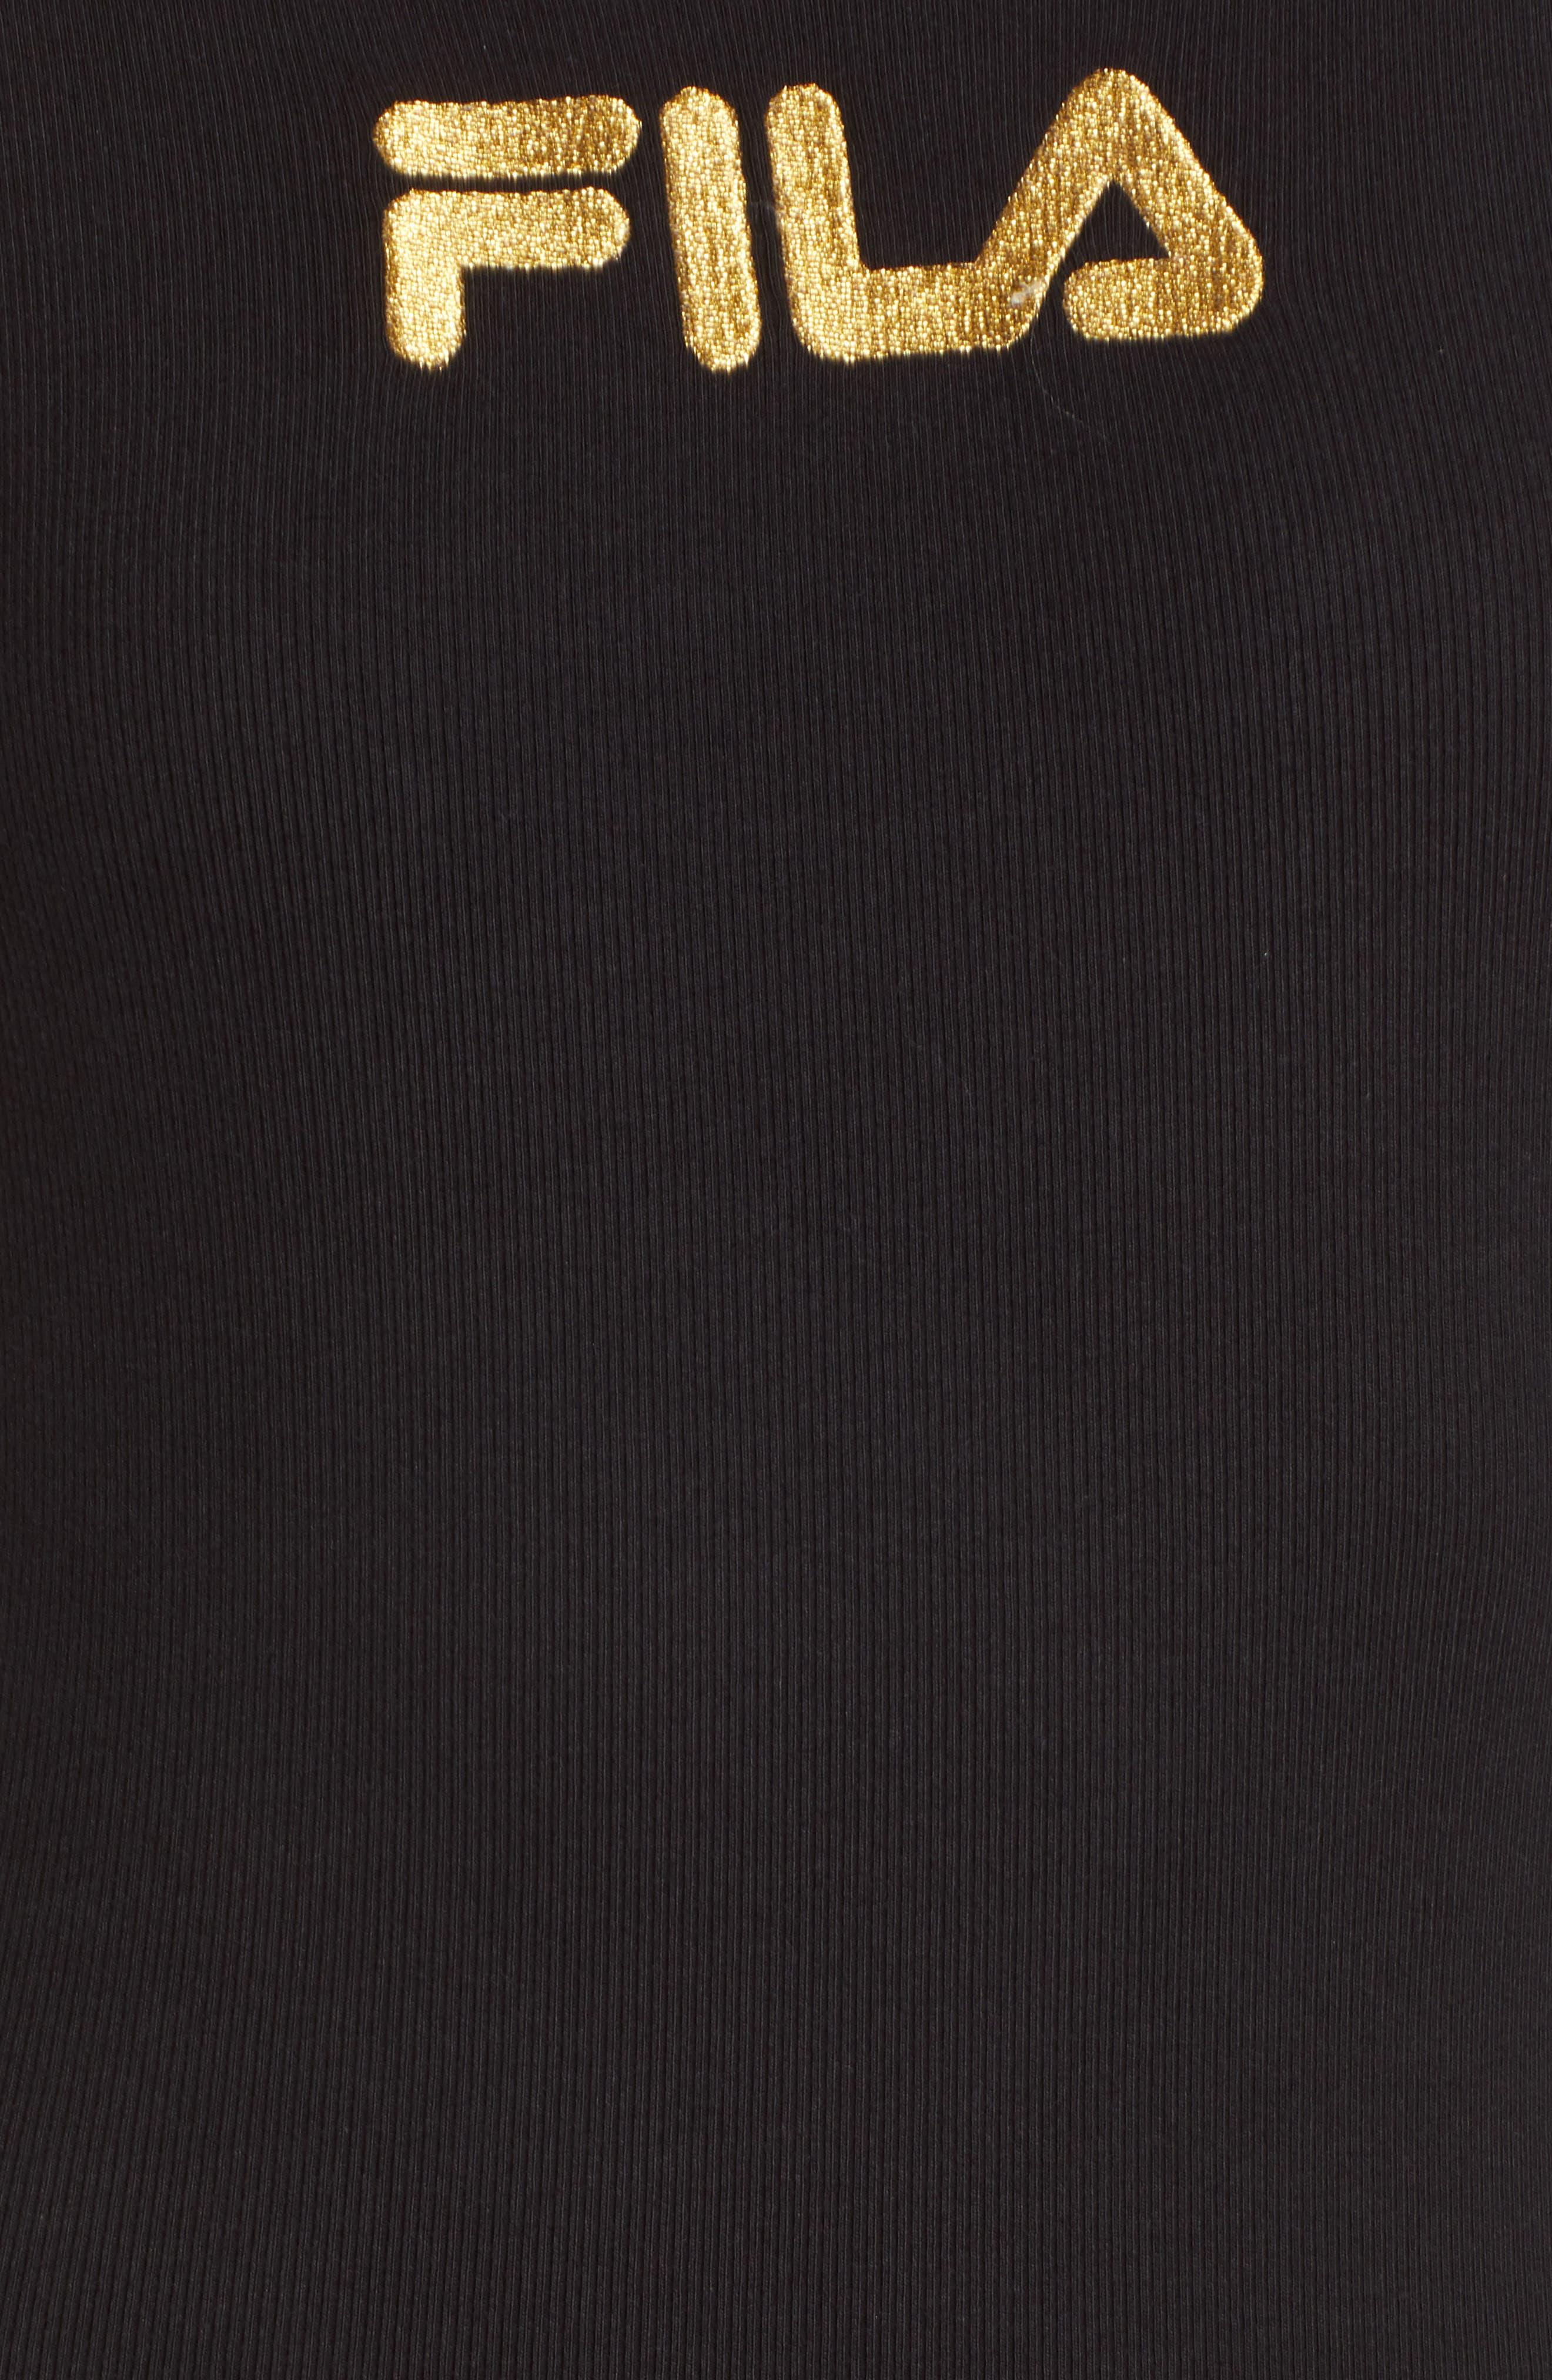 Ivory Unitard,                             Alternate thumbnail 6, color,                             001